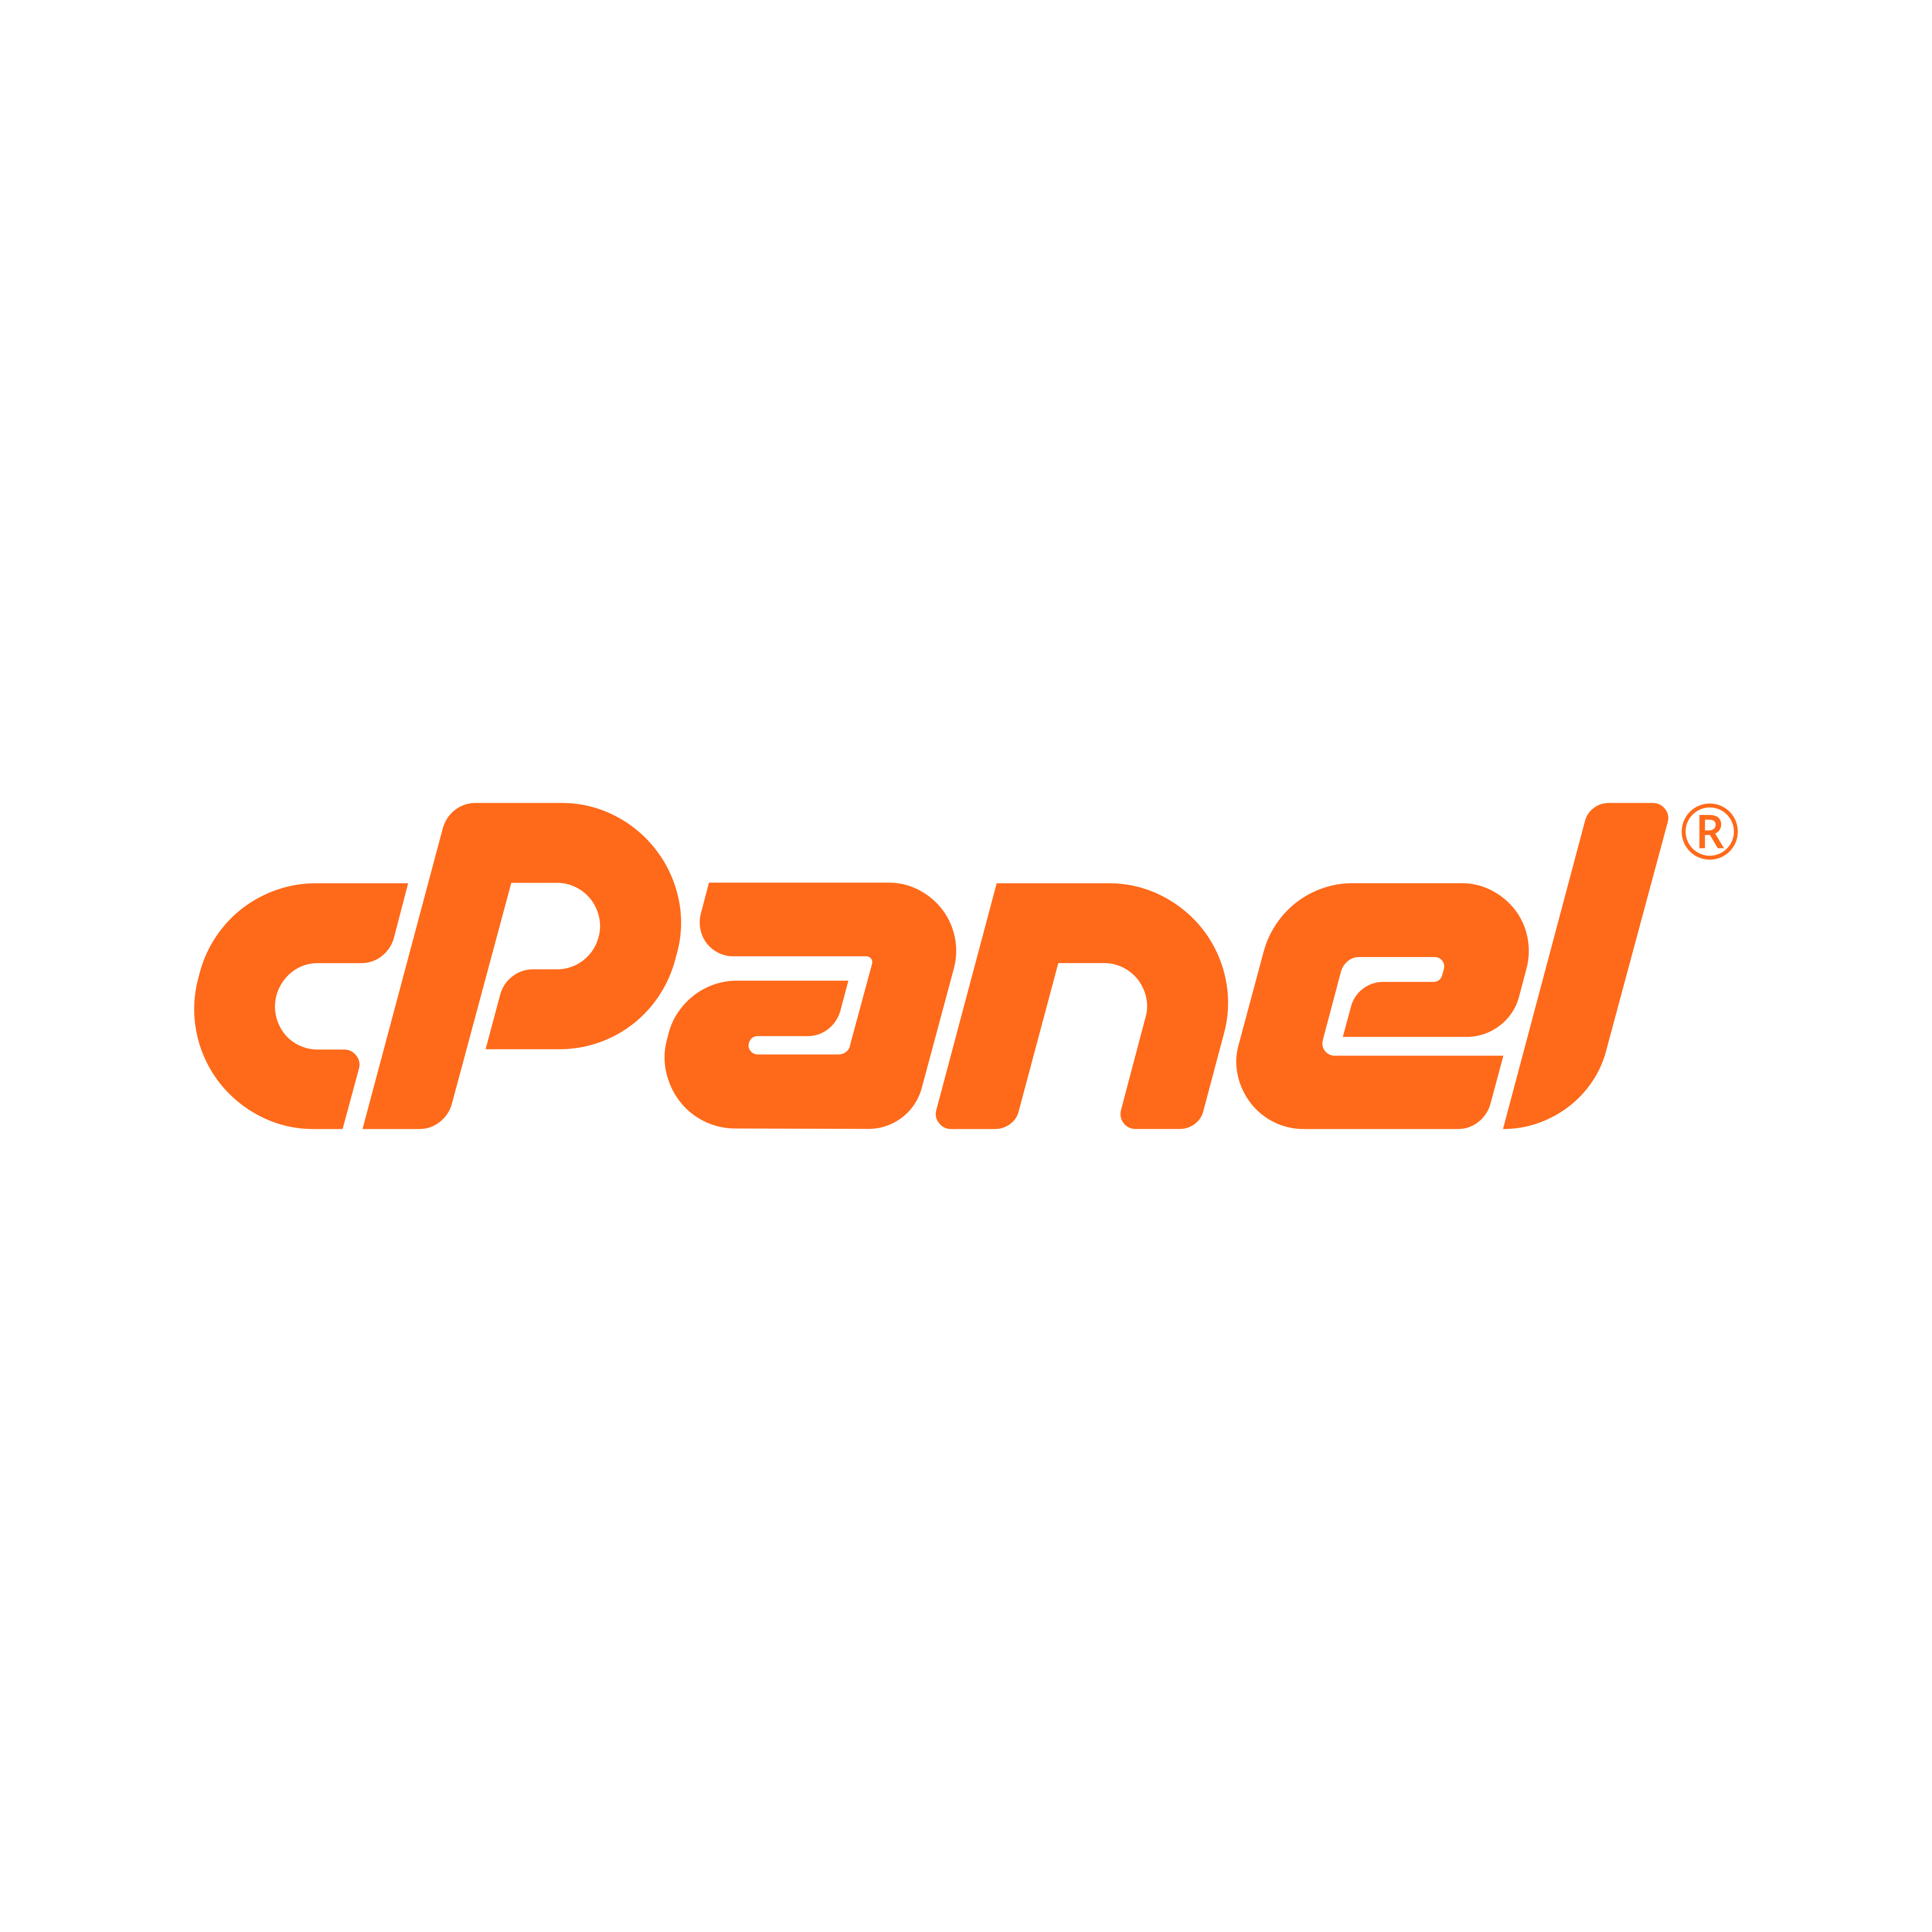 cpanel logo 0 - cPanel Logo